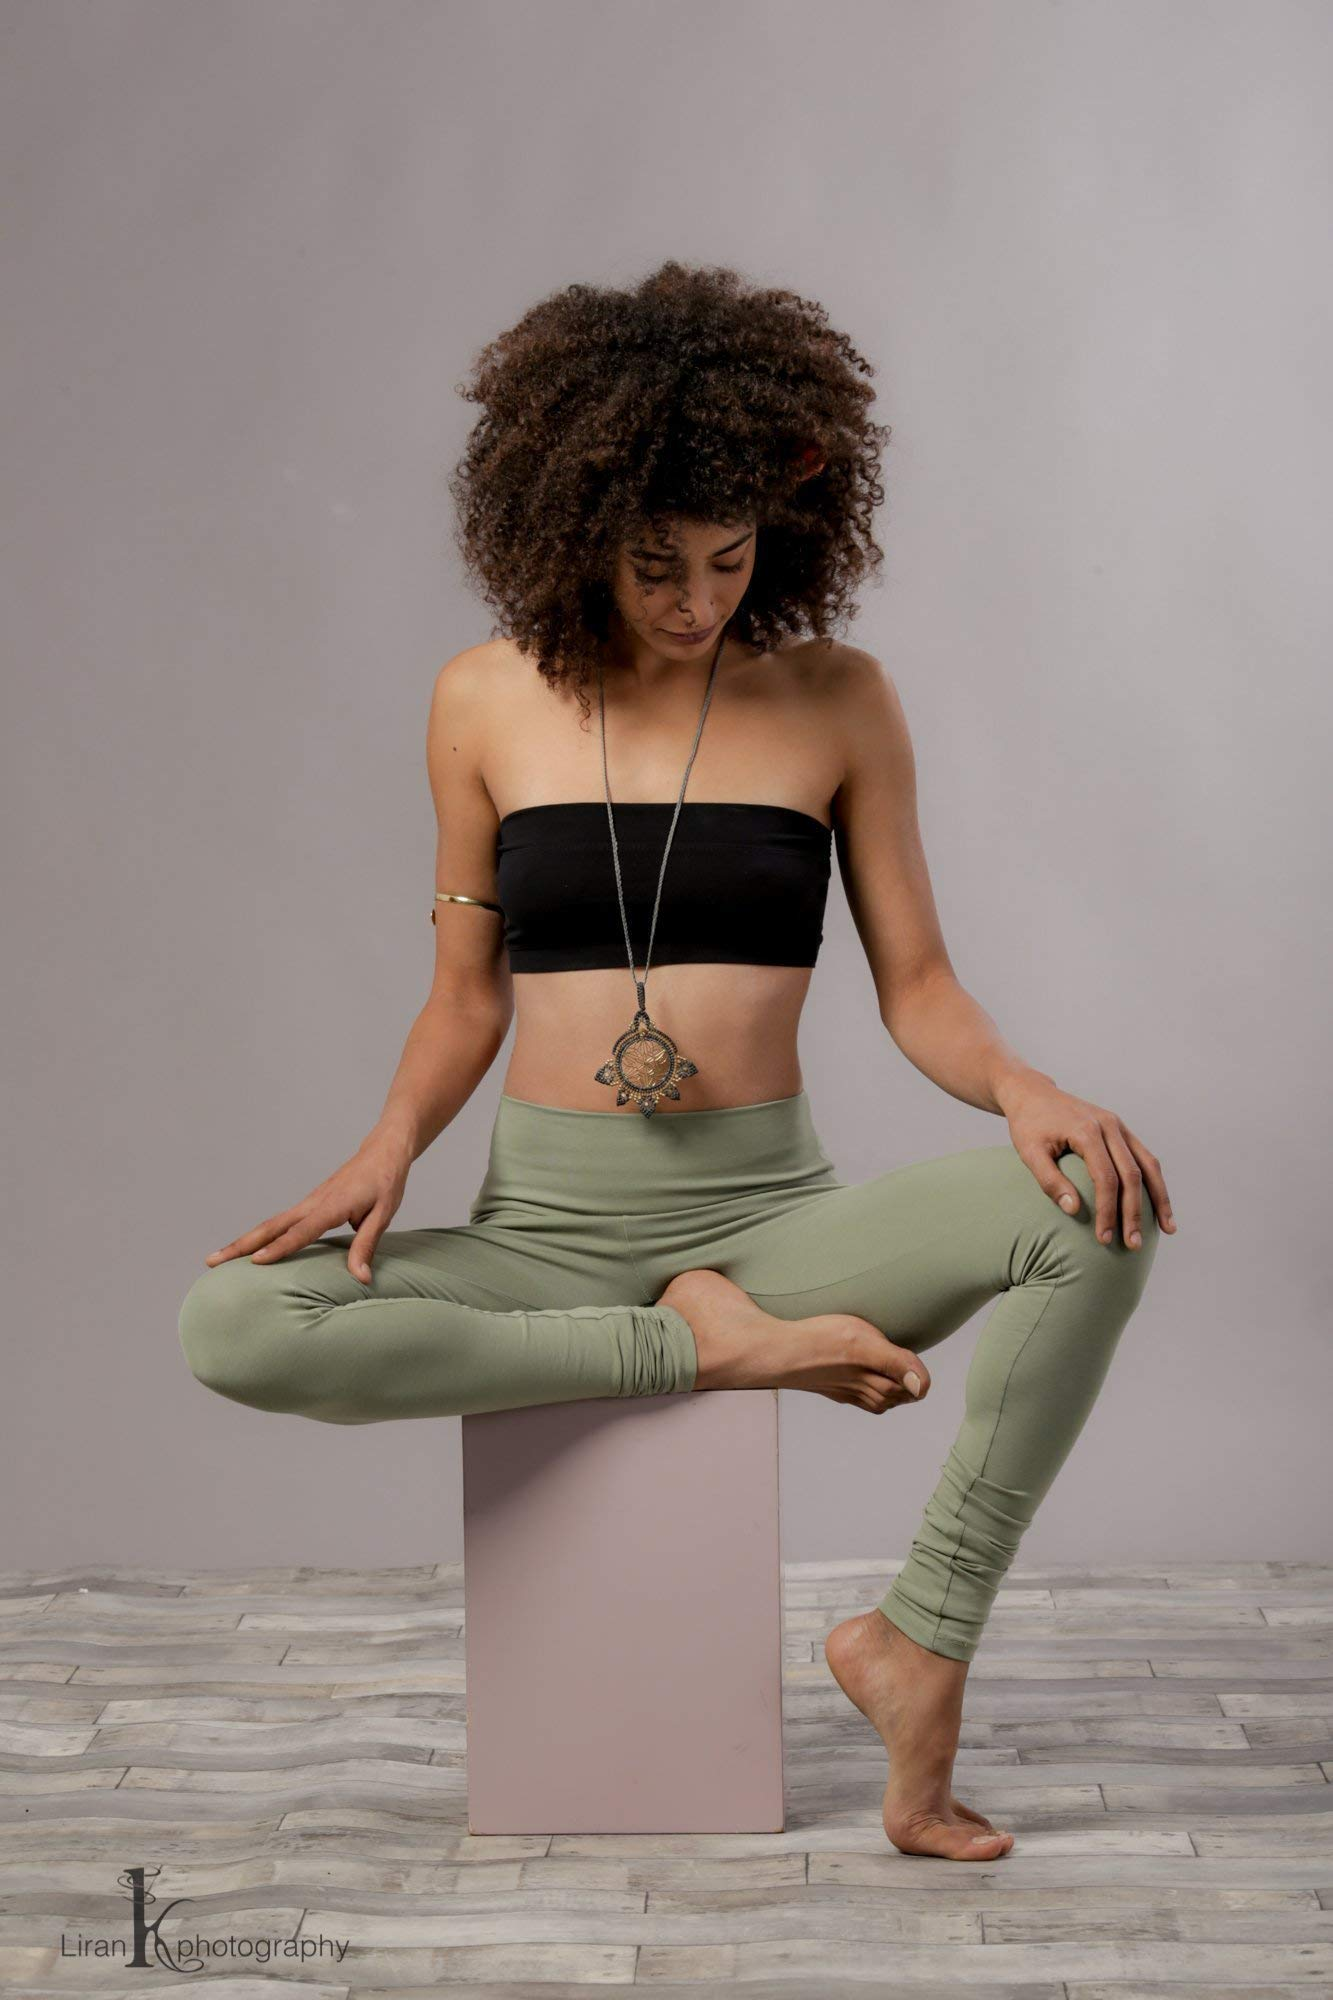 Handmade Green Women's Yoga Activewear Pants, Workout Running Bohemian Legging, Yoga Fashion Cloths by SamayaFashion